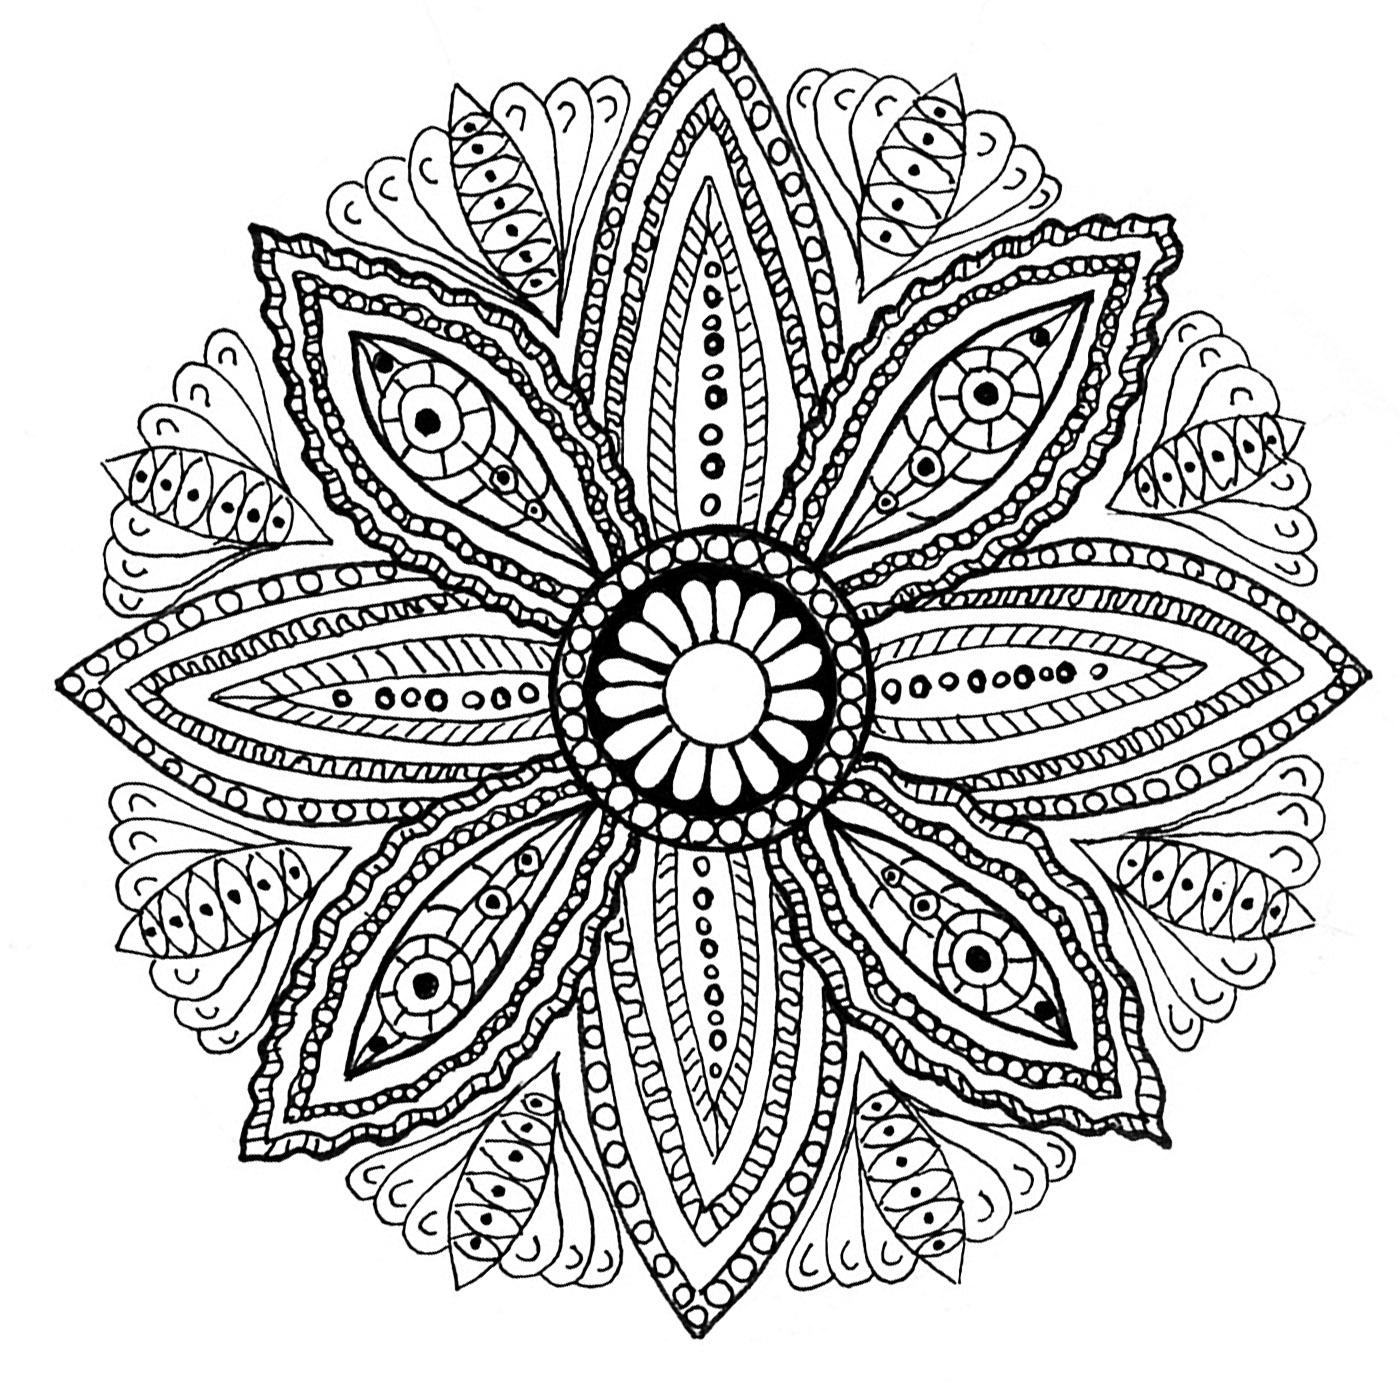 Mandala Feuilles - Mandalas - Coloriages Difficiles Pour destiné Coloriage De Mandala Difficile A Imprimer